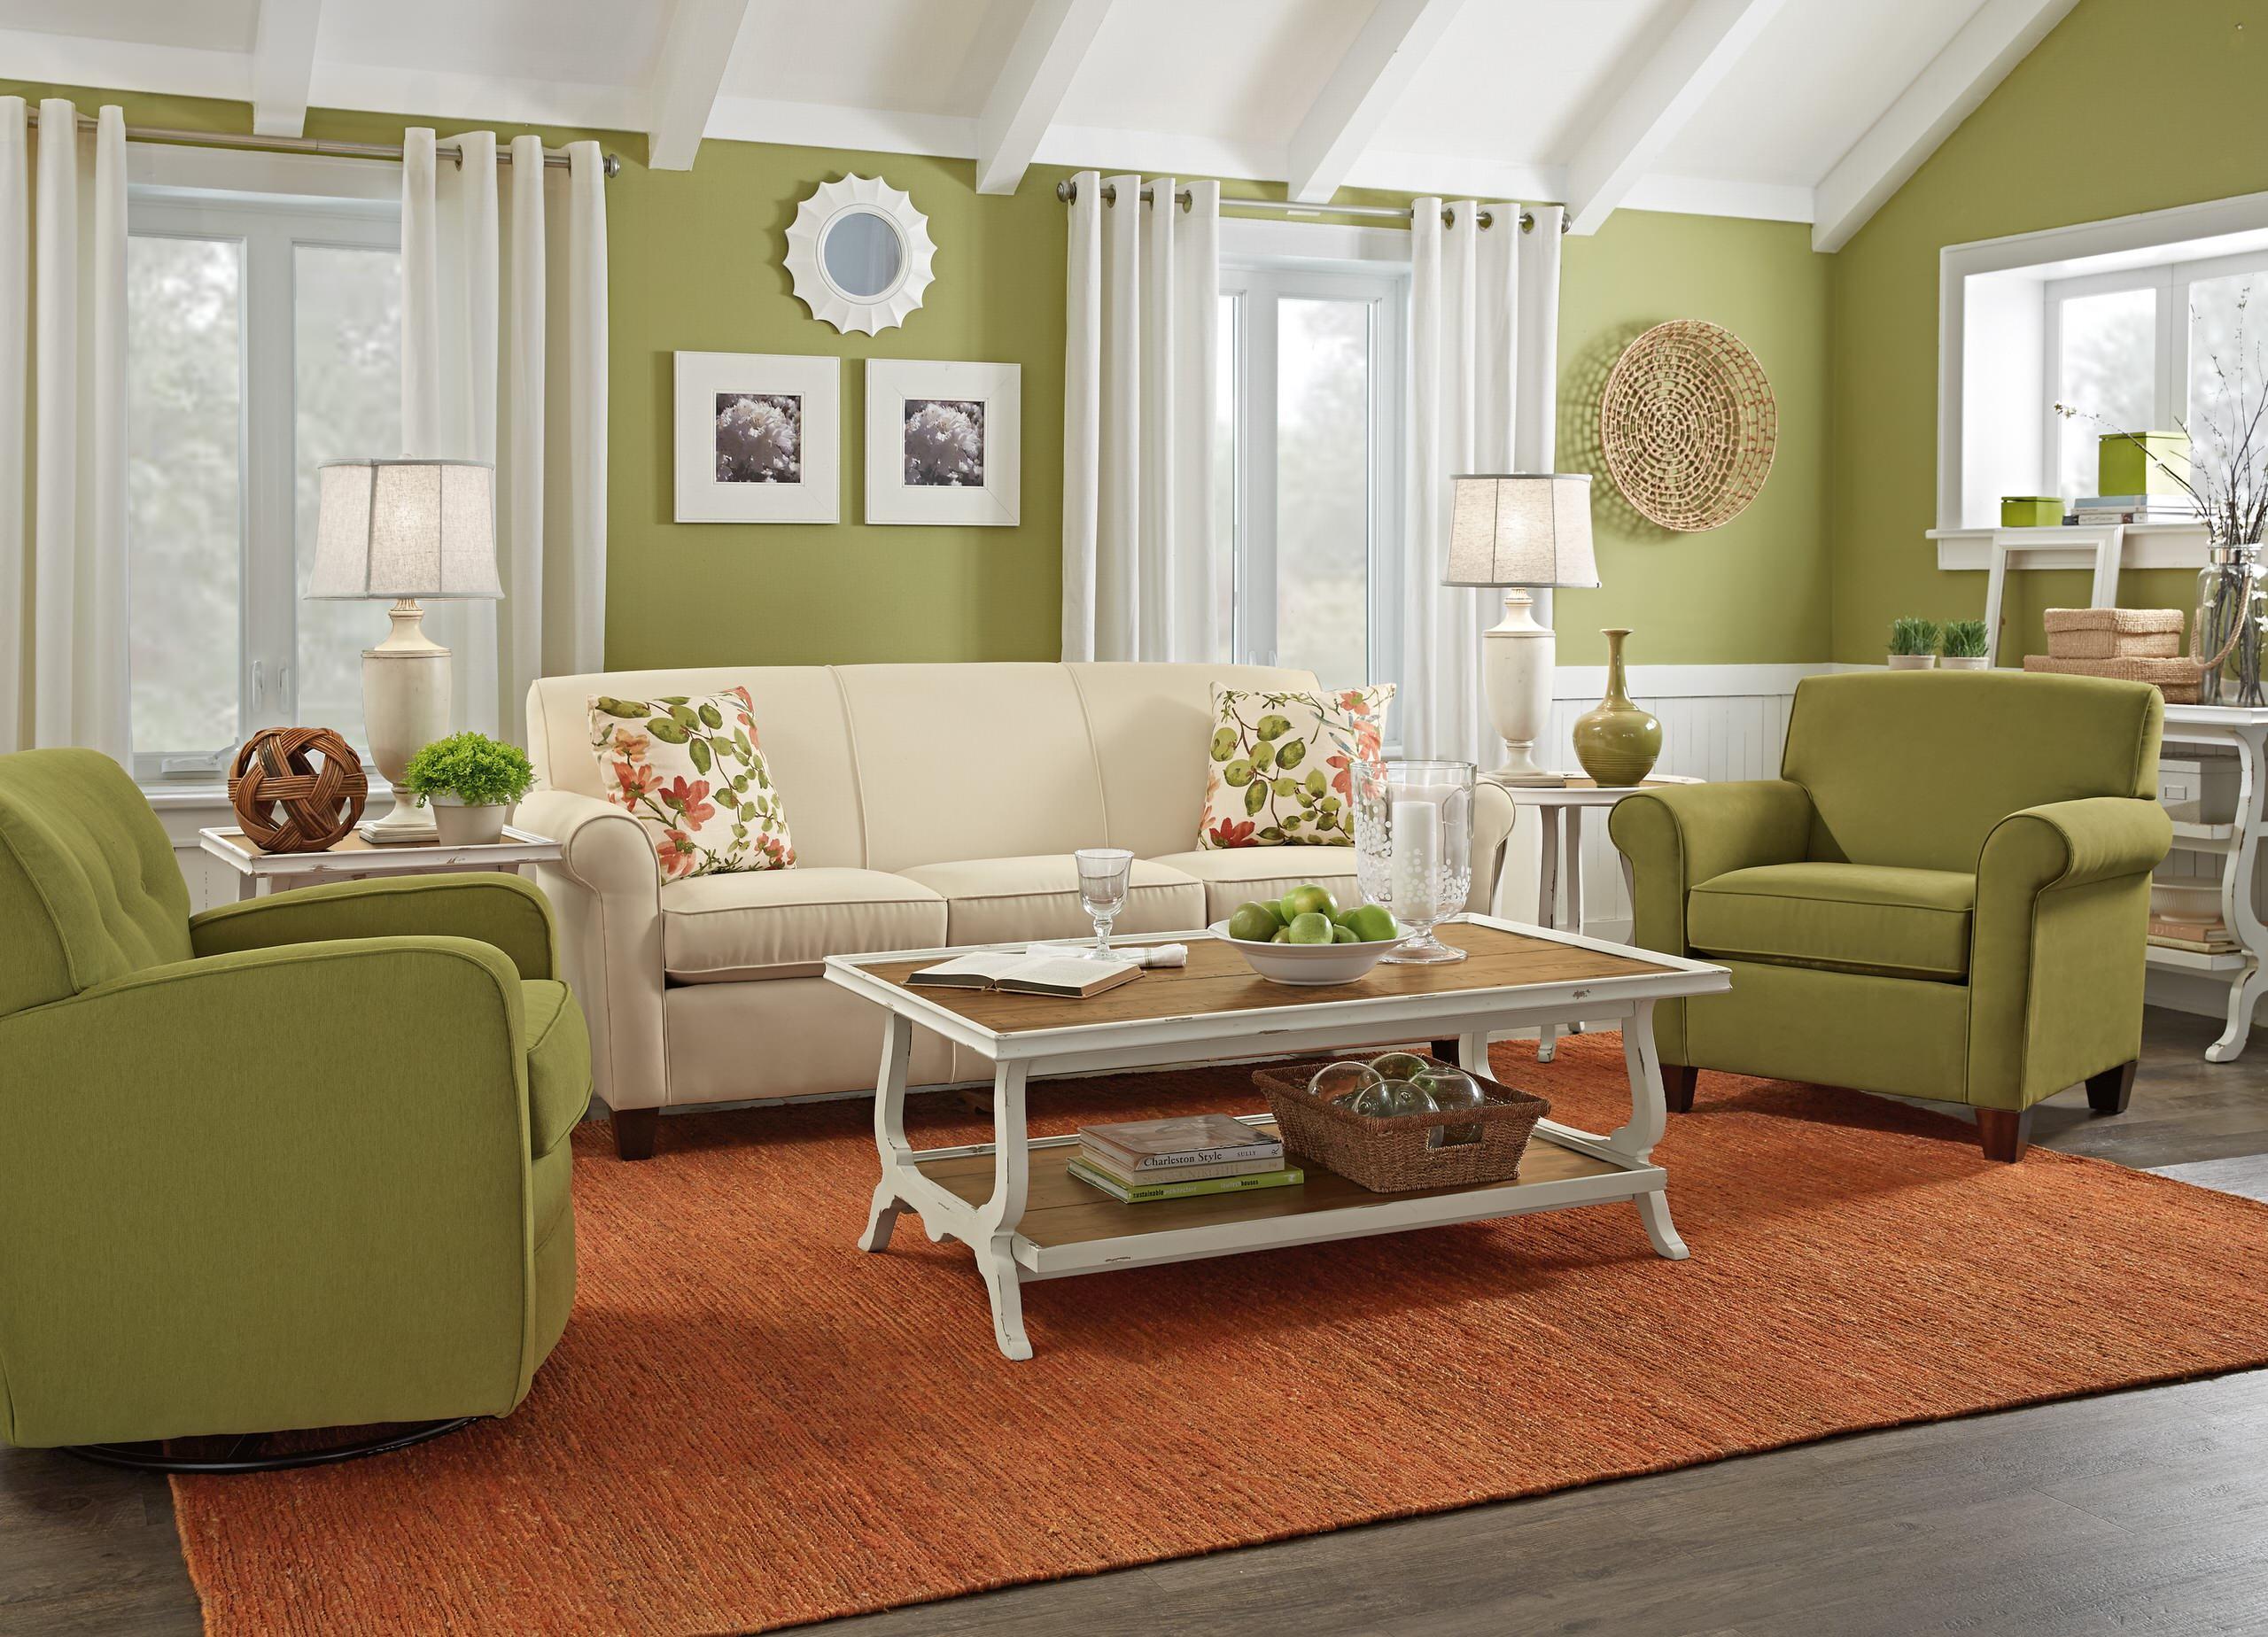 Olive Green Living Room Ideas Photos Houzz